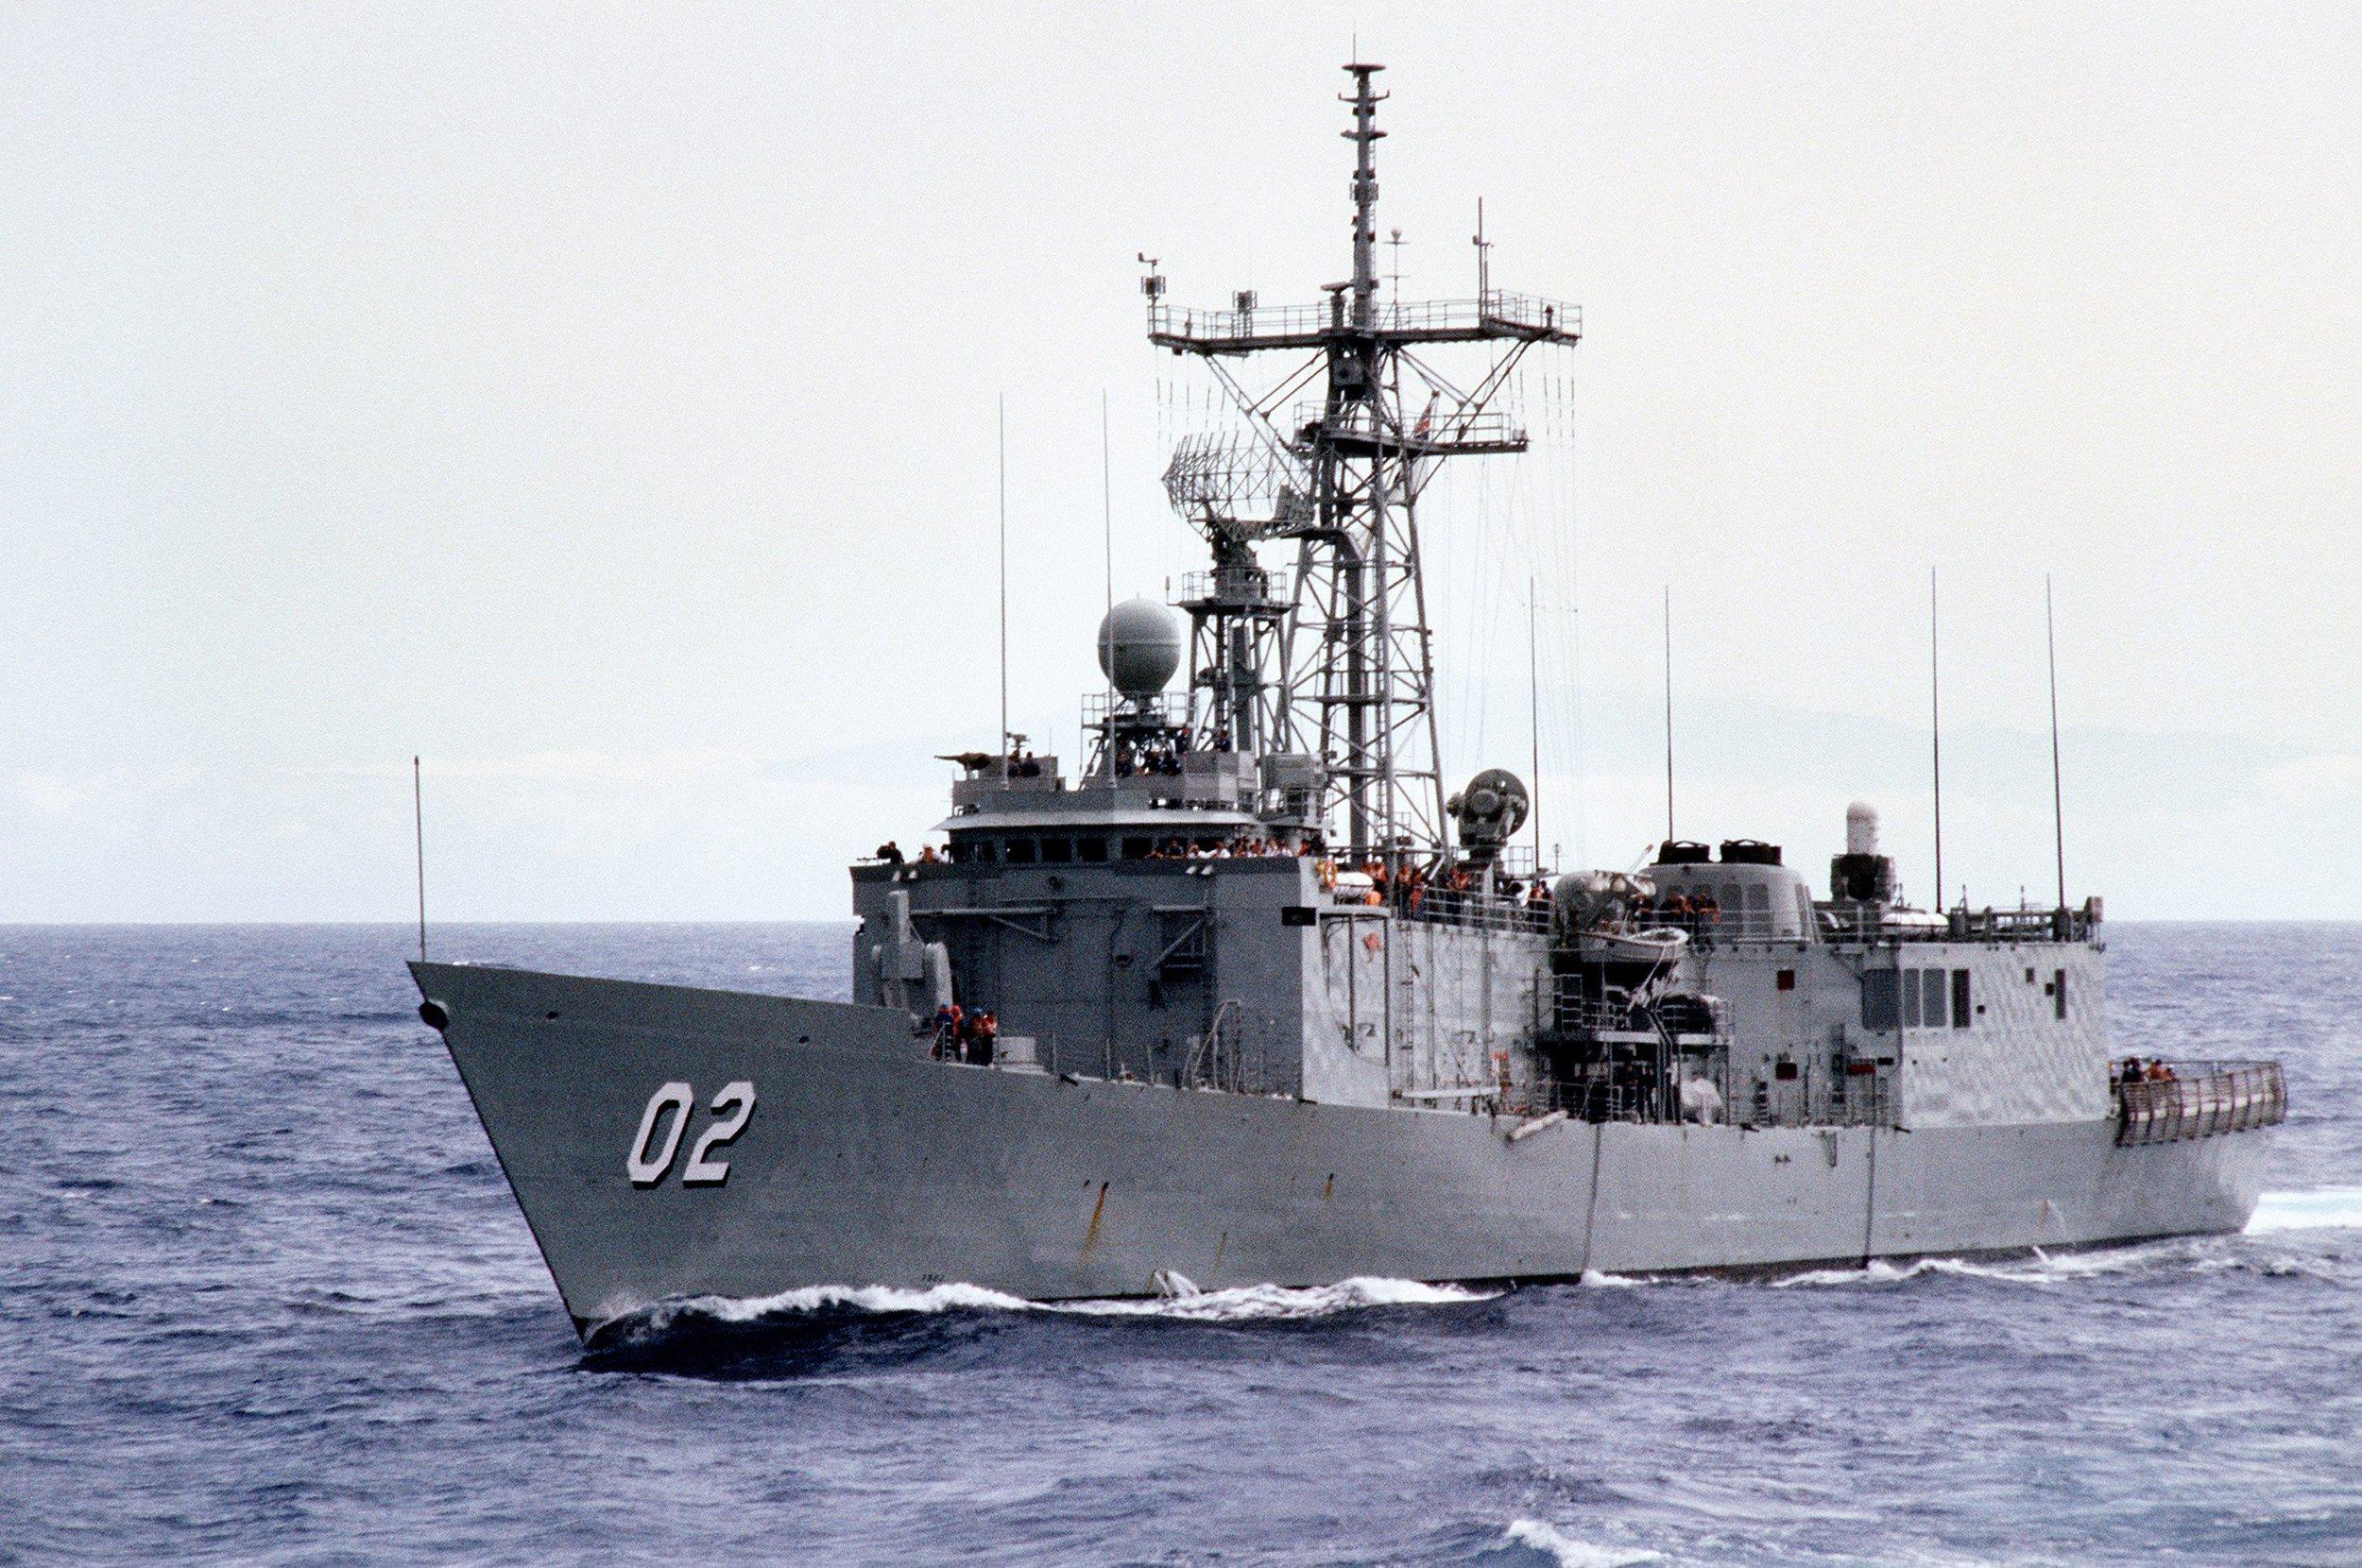 Adelaide class frigate